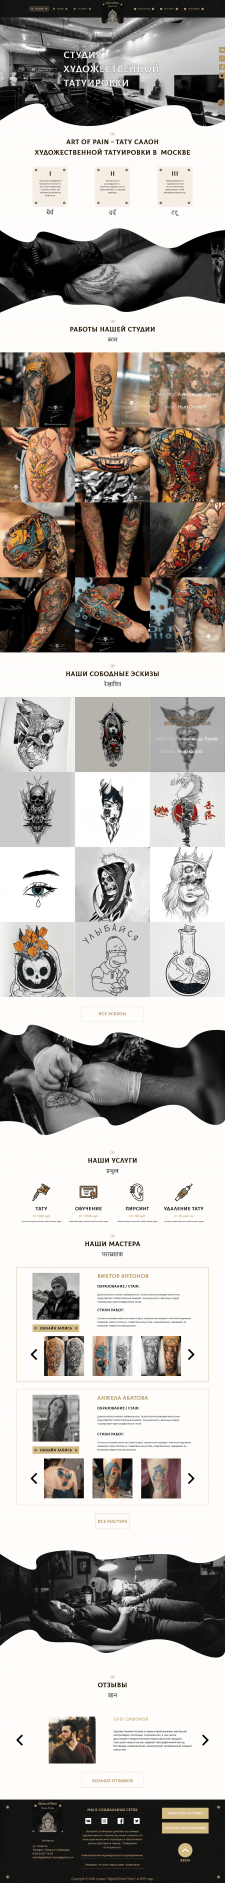 Queen of pain — дизайн сайта